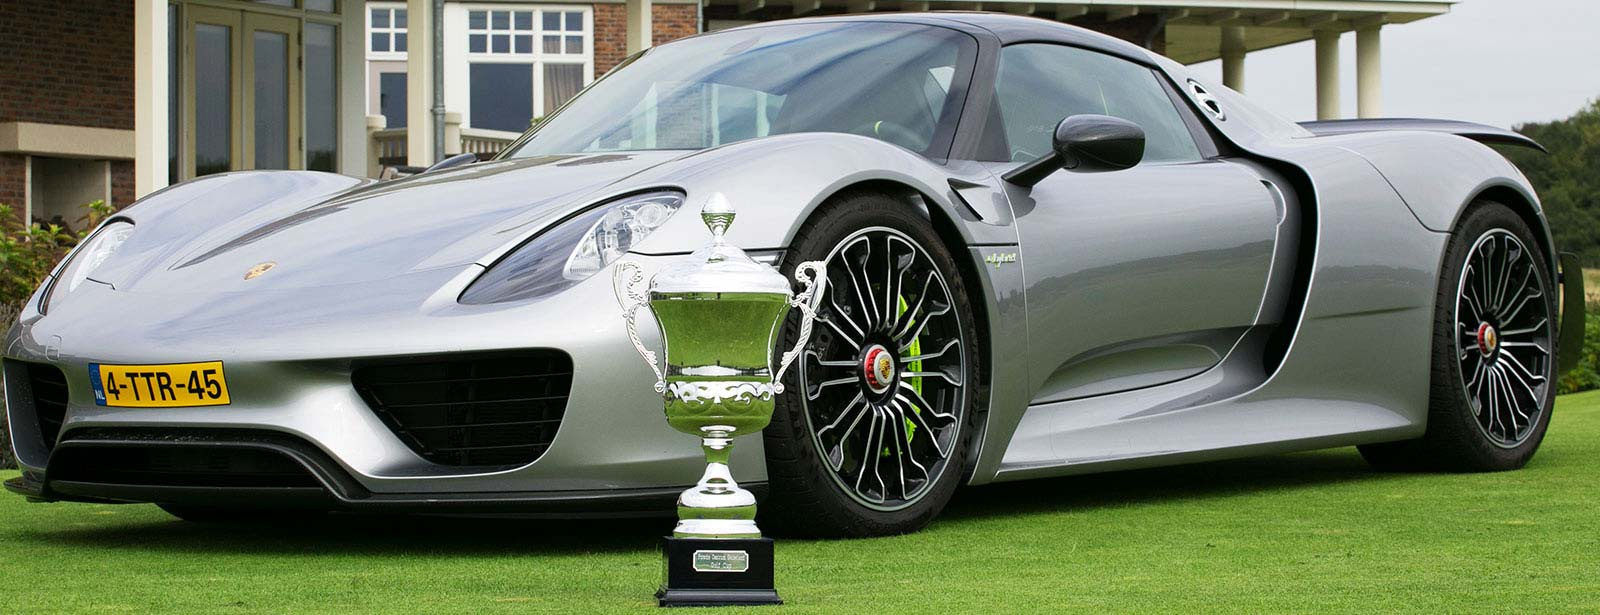 Golf Cup 2014